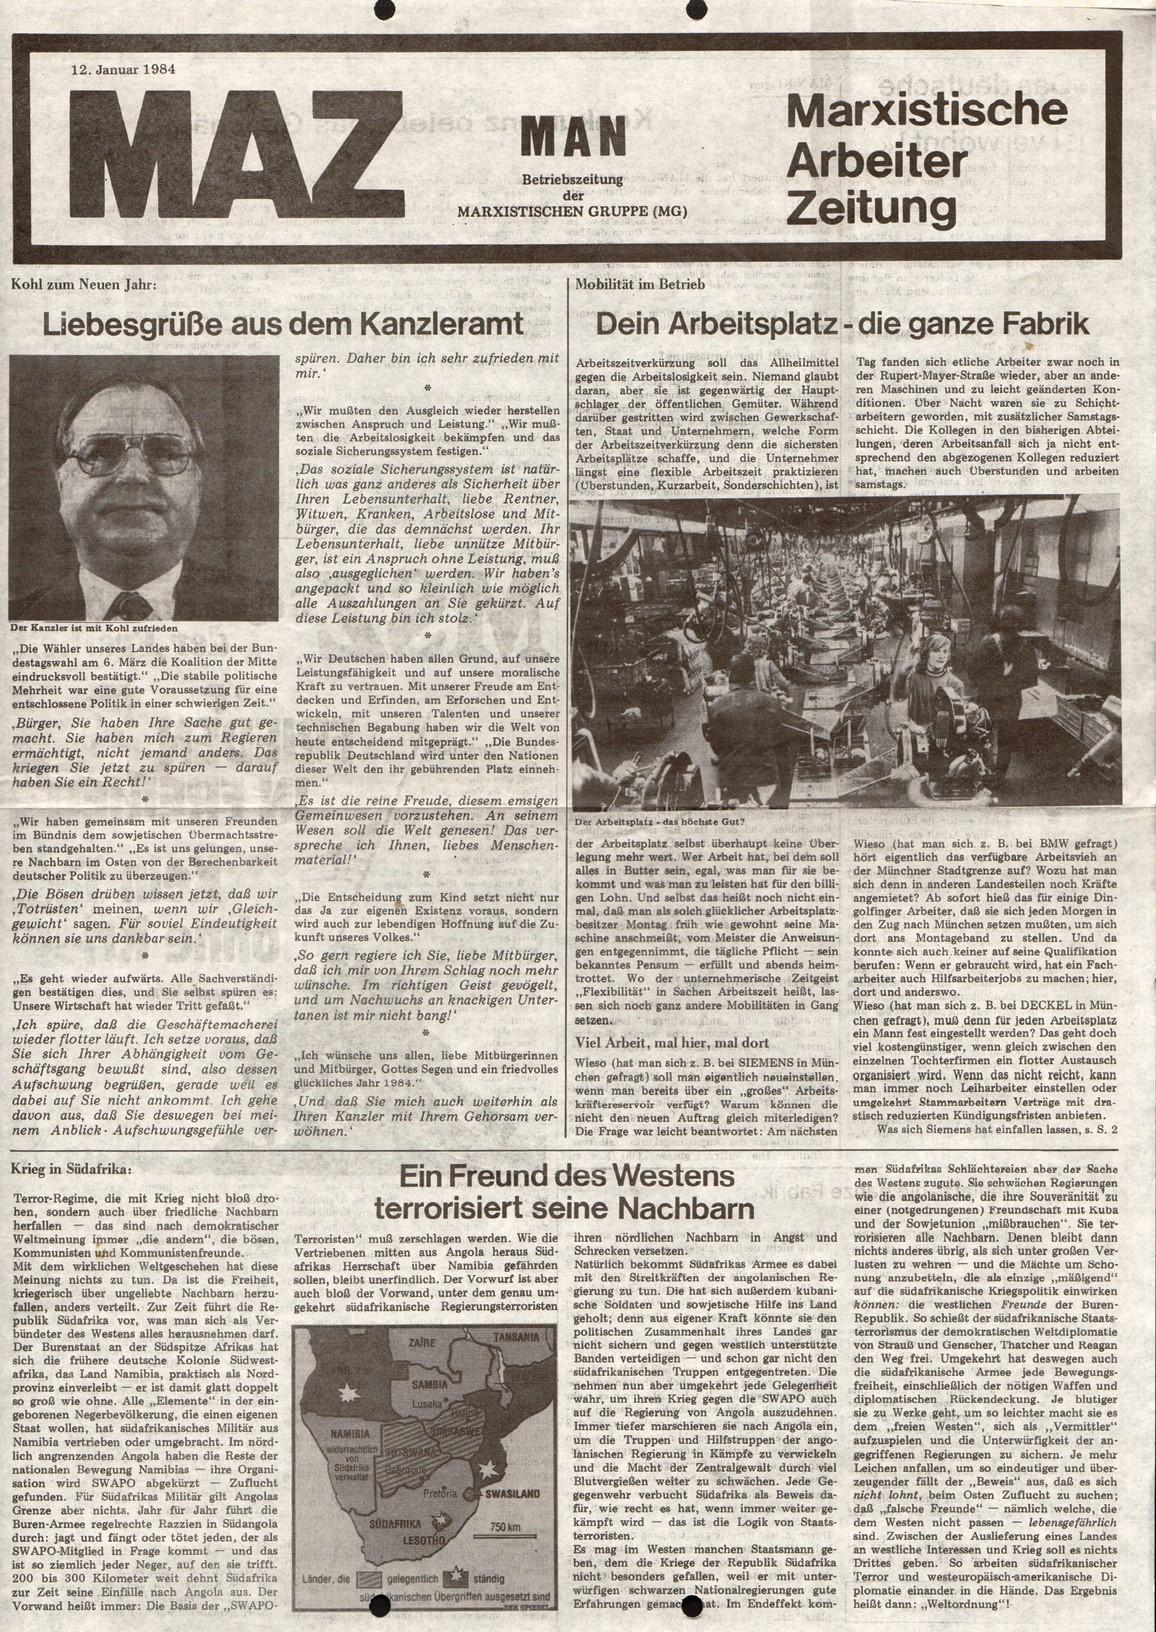 Muenchen_MG_MAZ_MAN_19840112_01